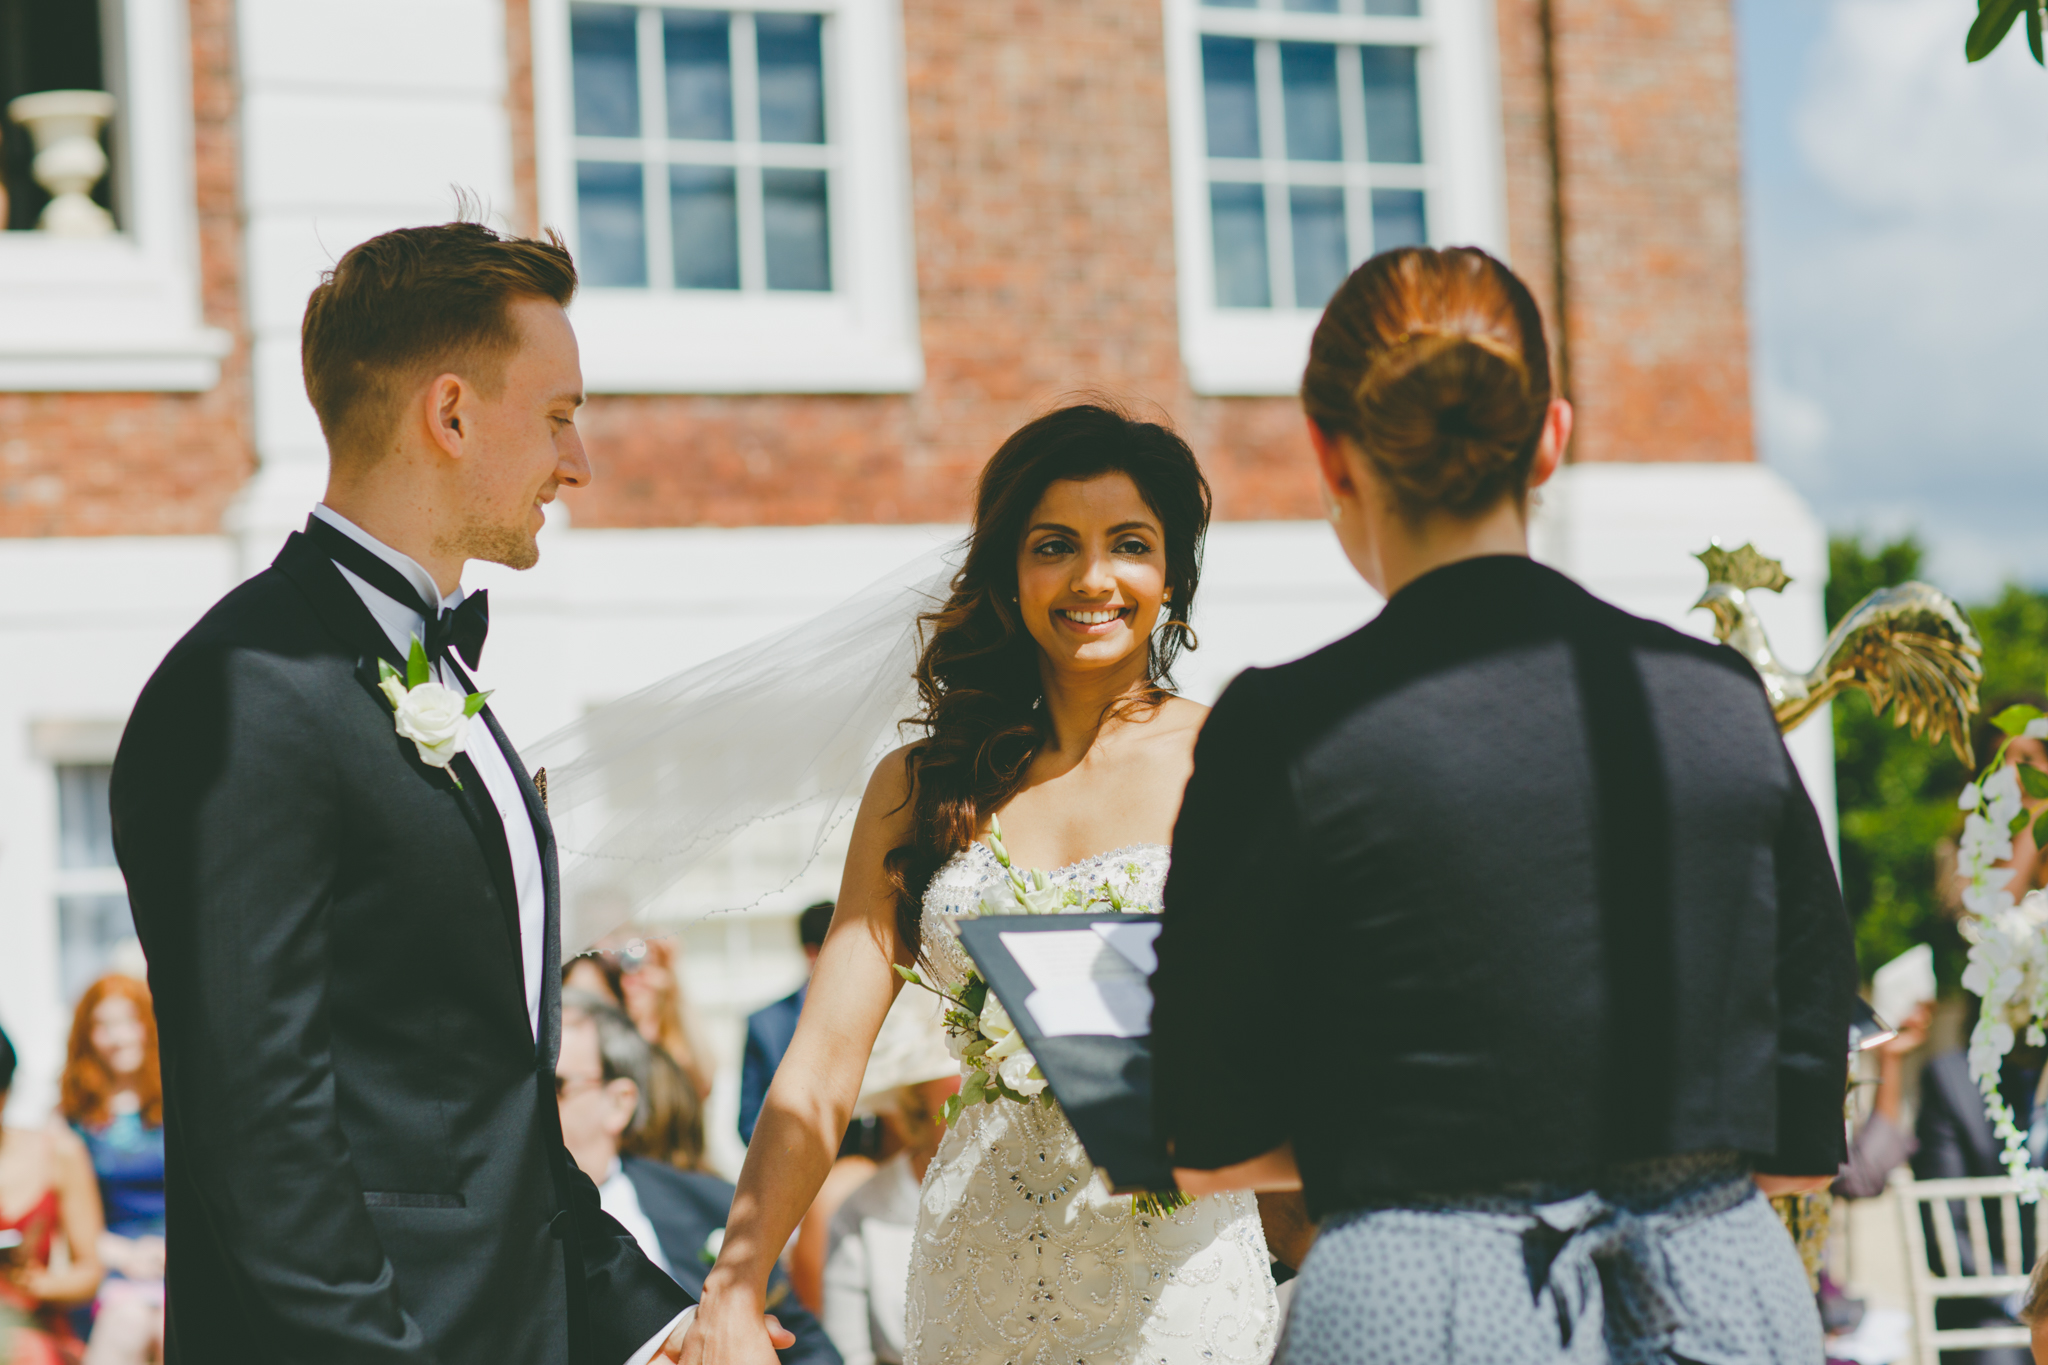 Amy Sampson Devon Wedding Photographer   Ishani and Iain's Wedding at Pyne's House, Exeter, Devon